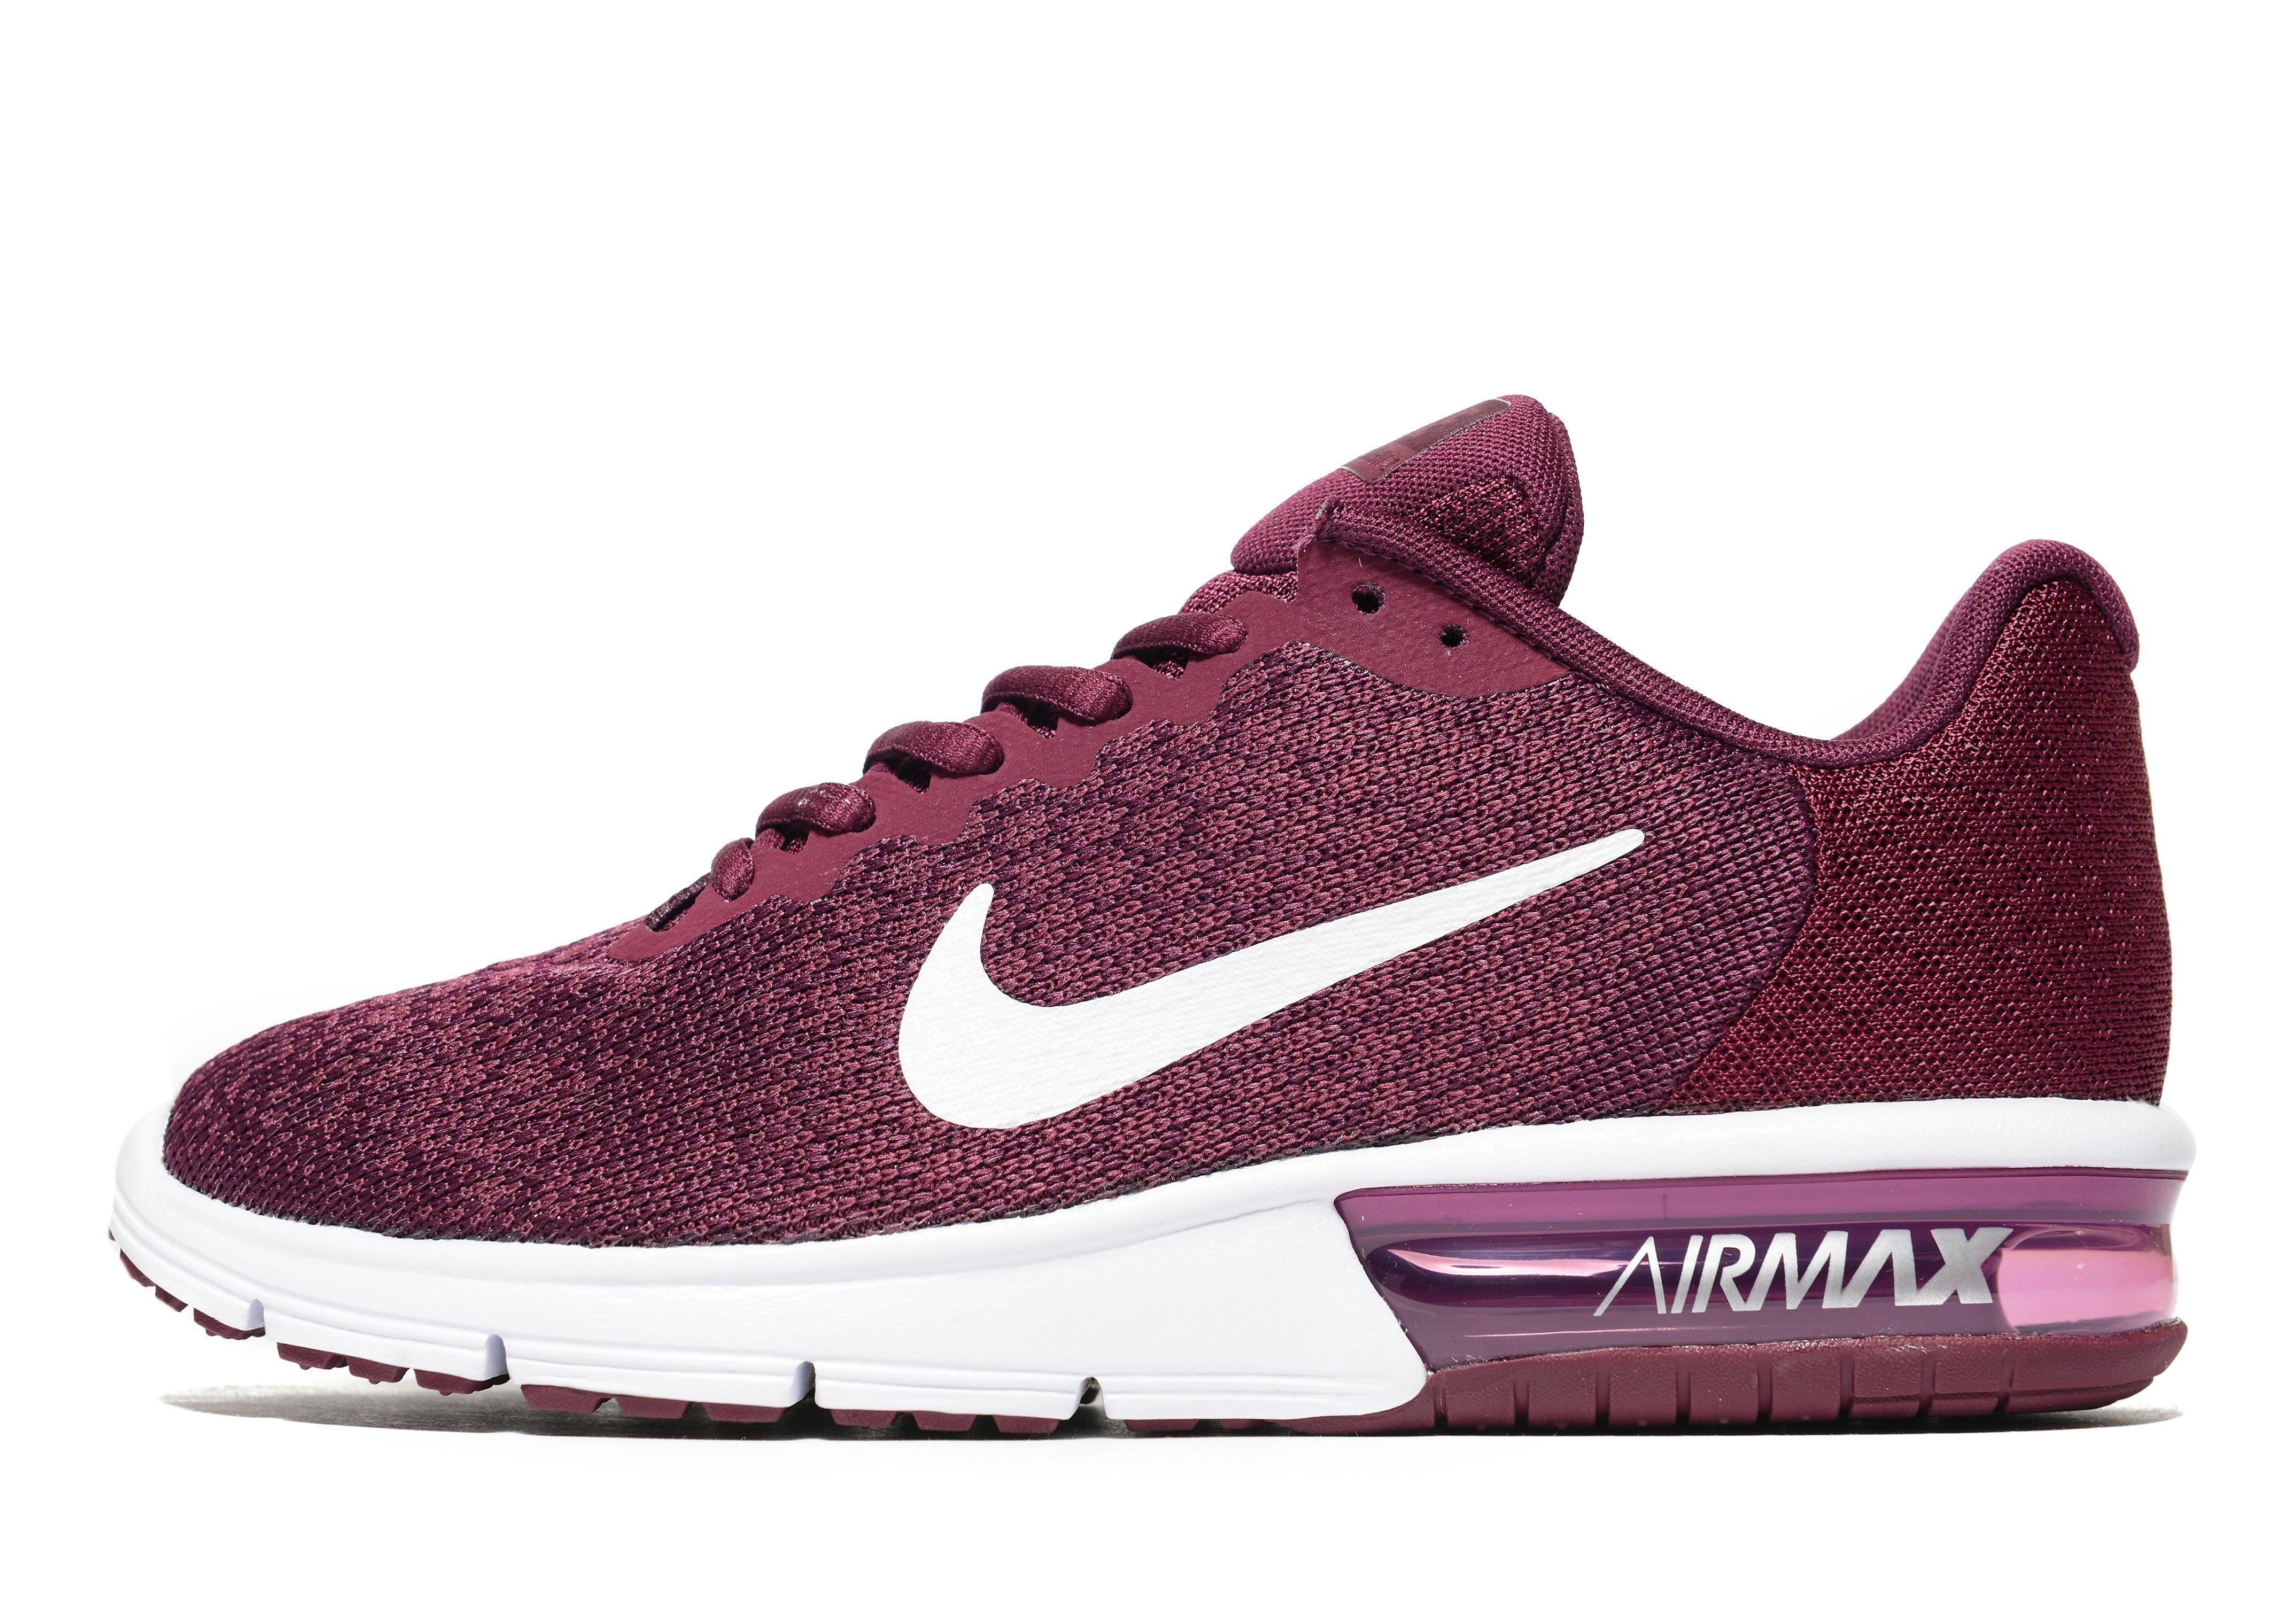 Nike Air Max Sequent 2 Femme